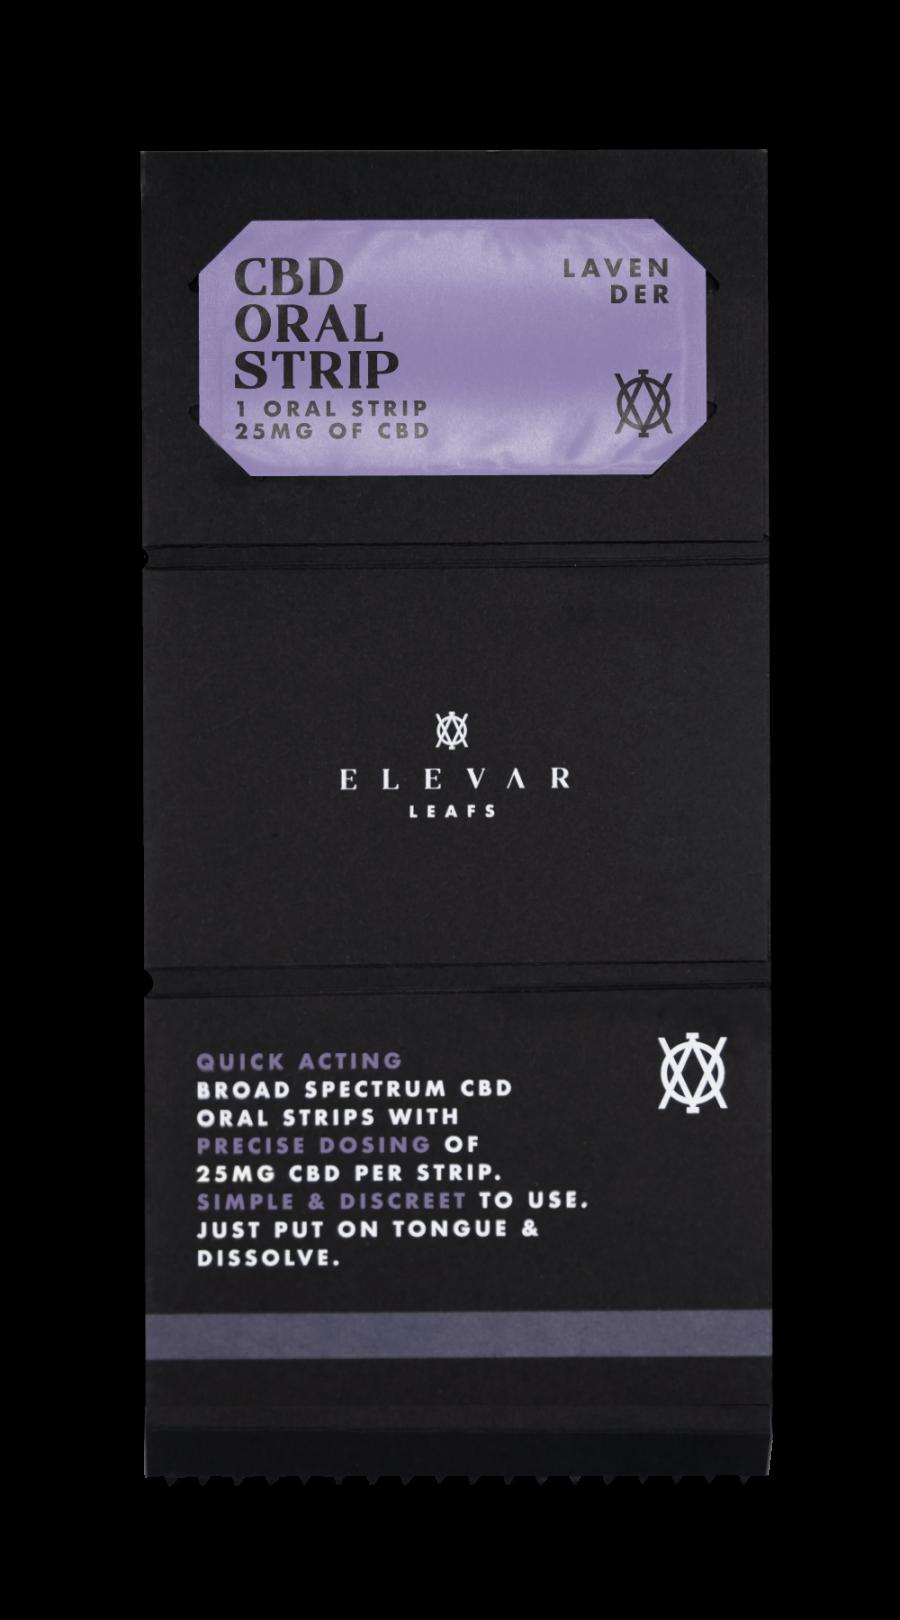 Elevar Hemp CBD Lavender CBD Oral Strips Single Pack Opened